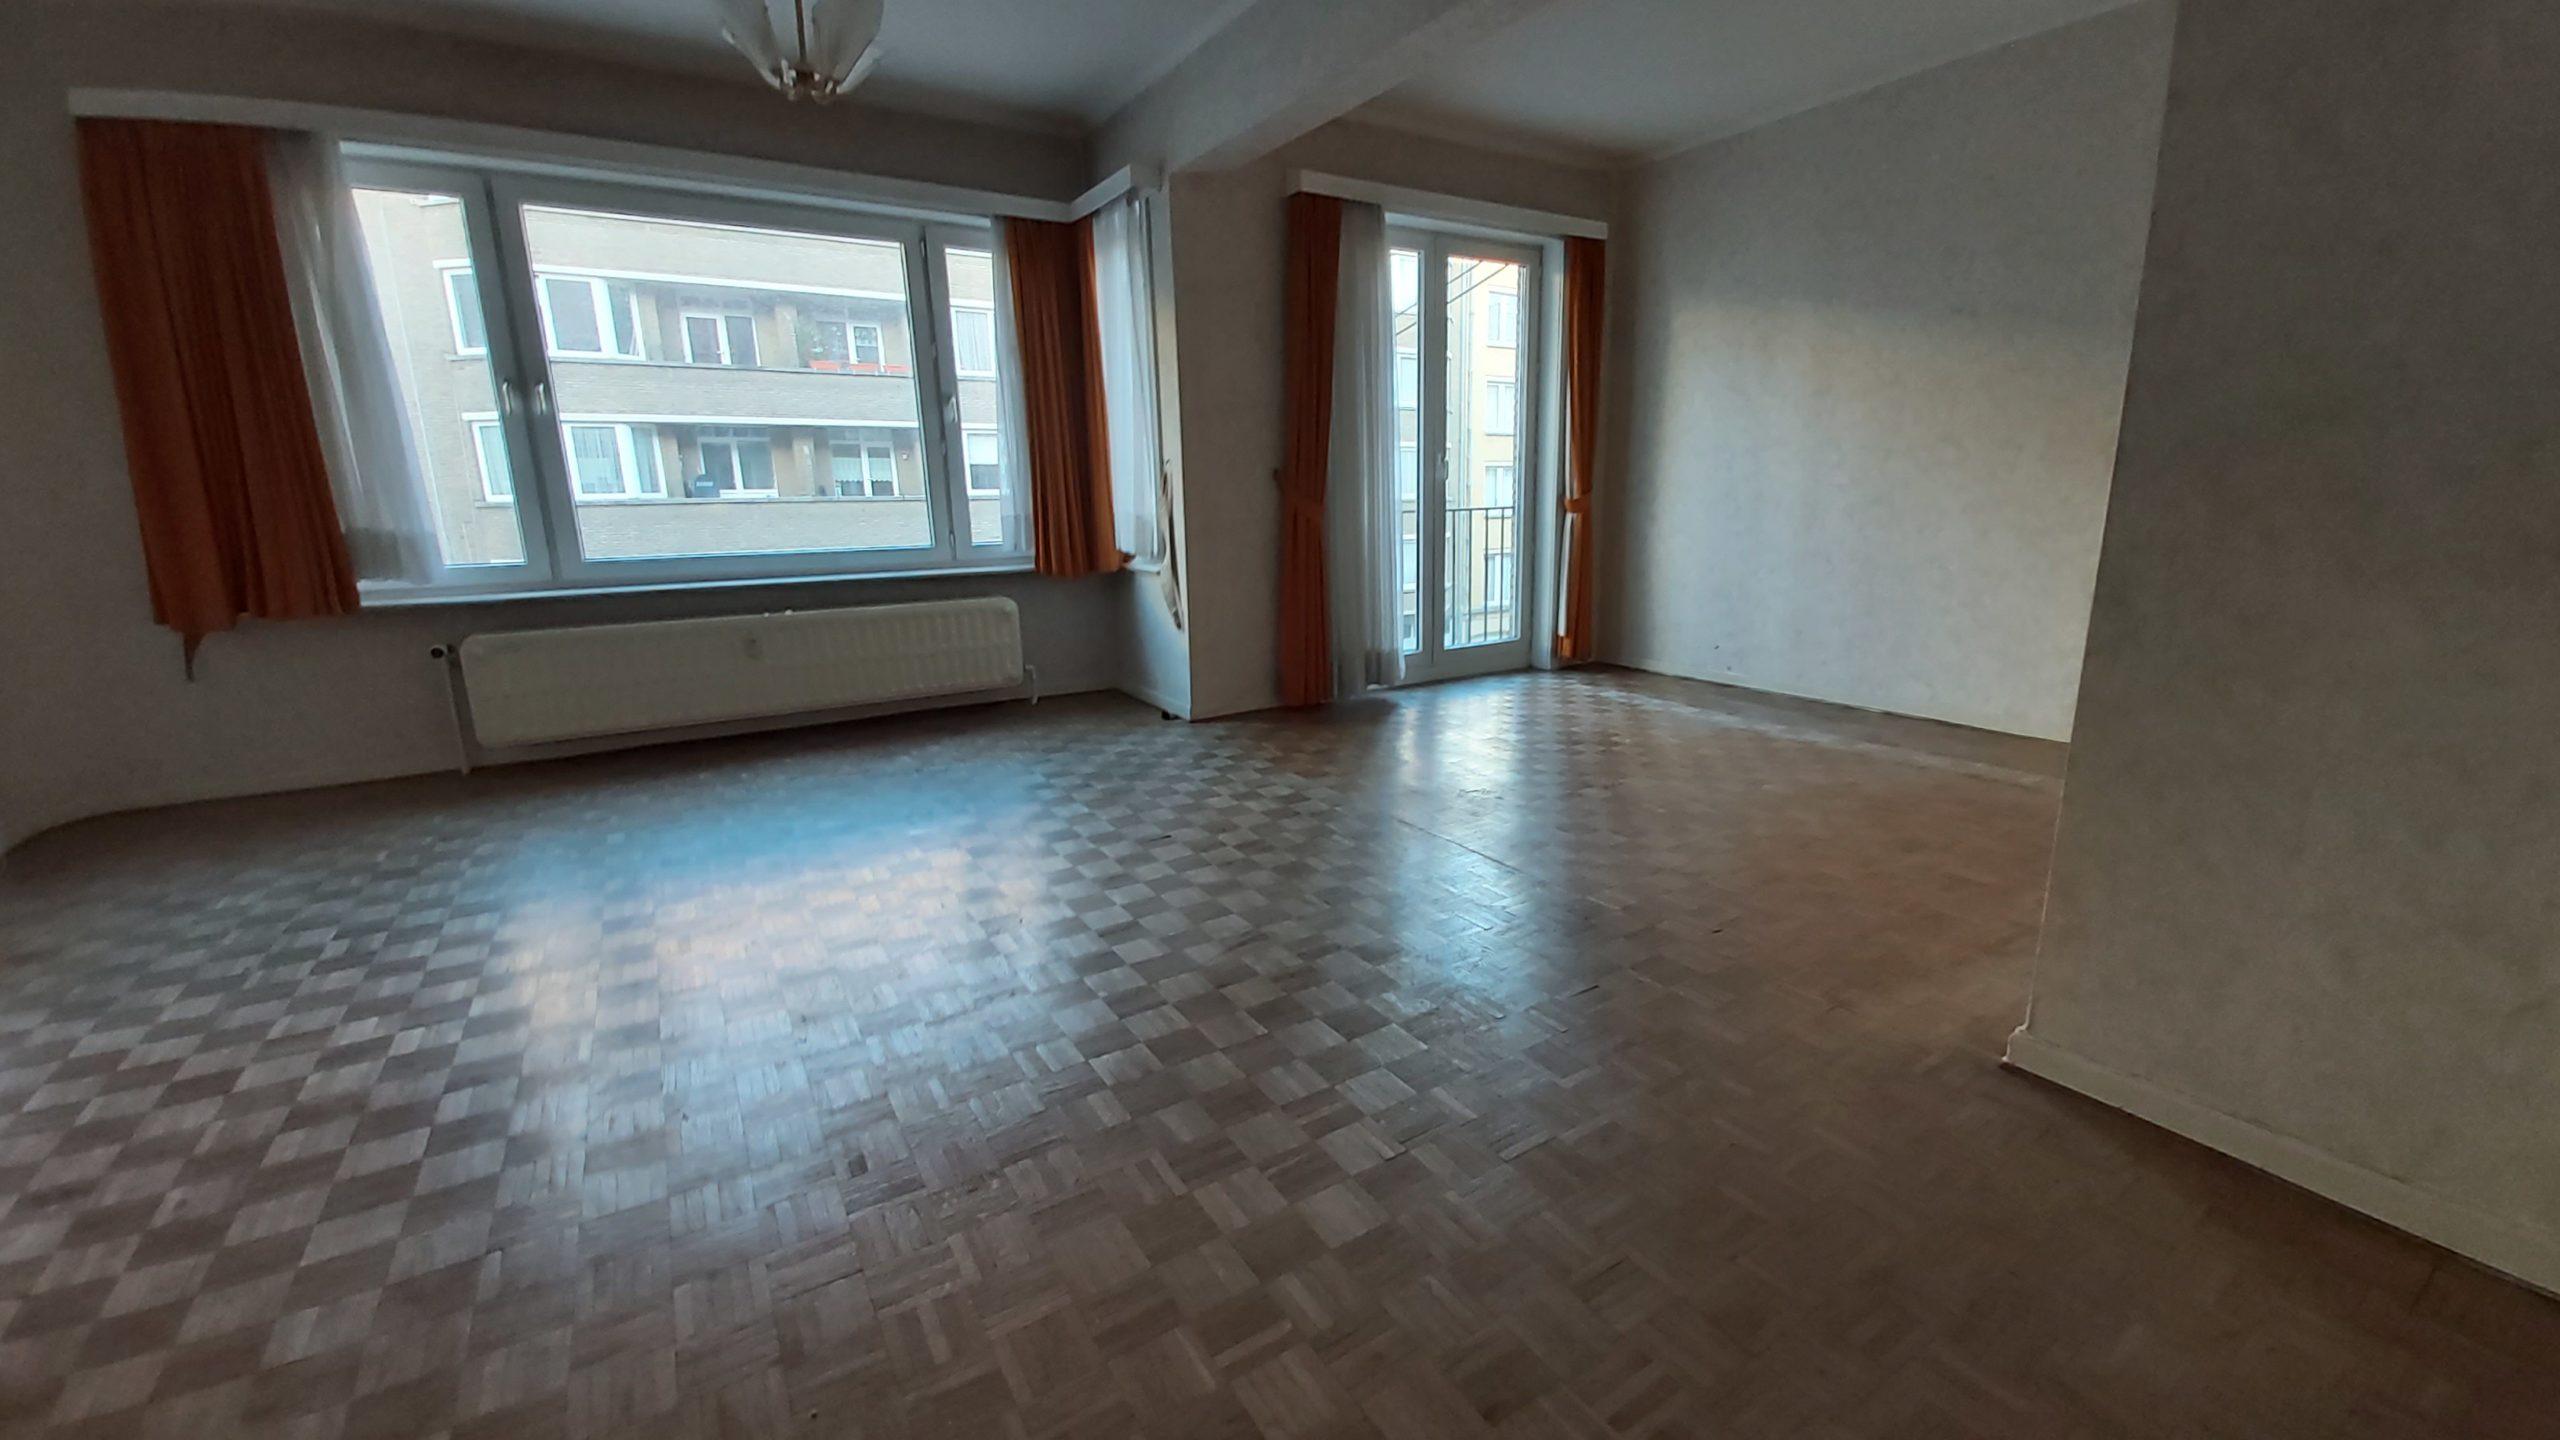 Prox métro Houba Brugman bel appartement lumineux 90m² 2 chs petite terrasse